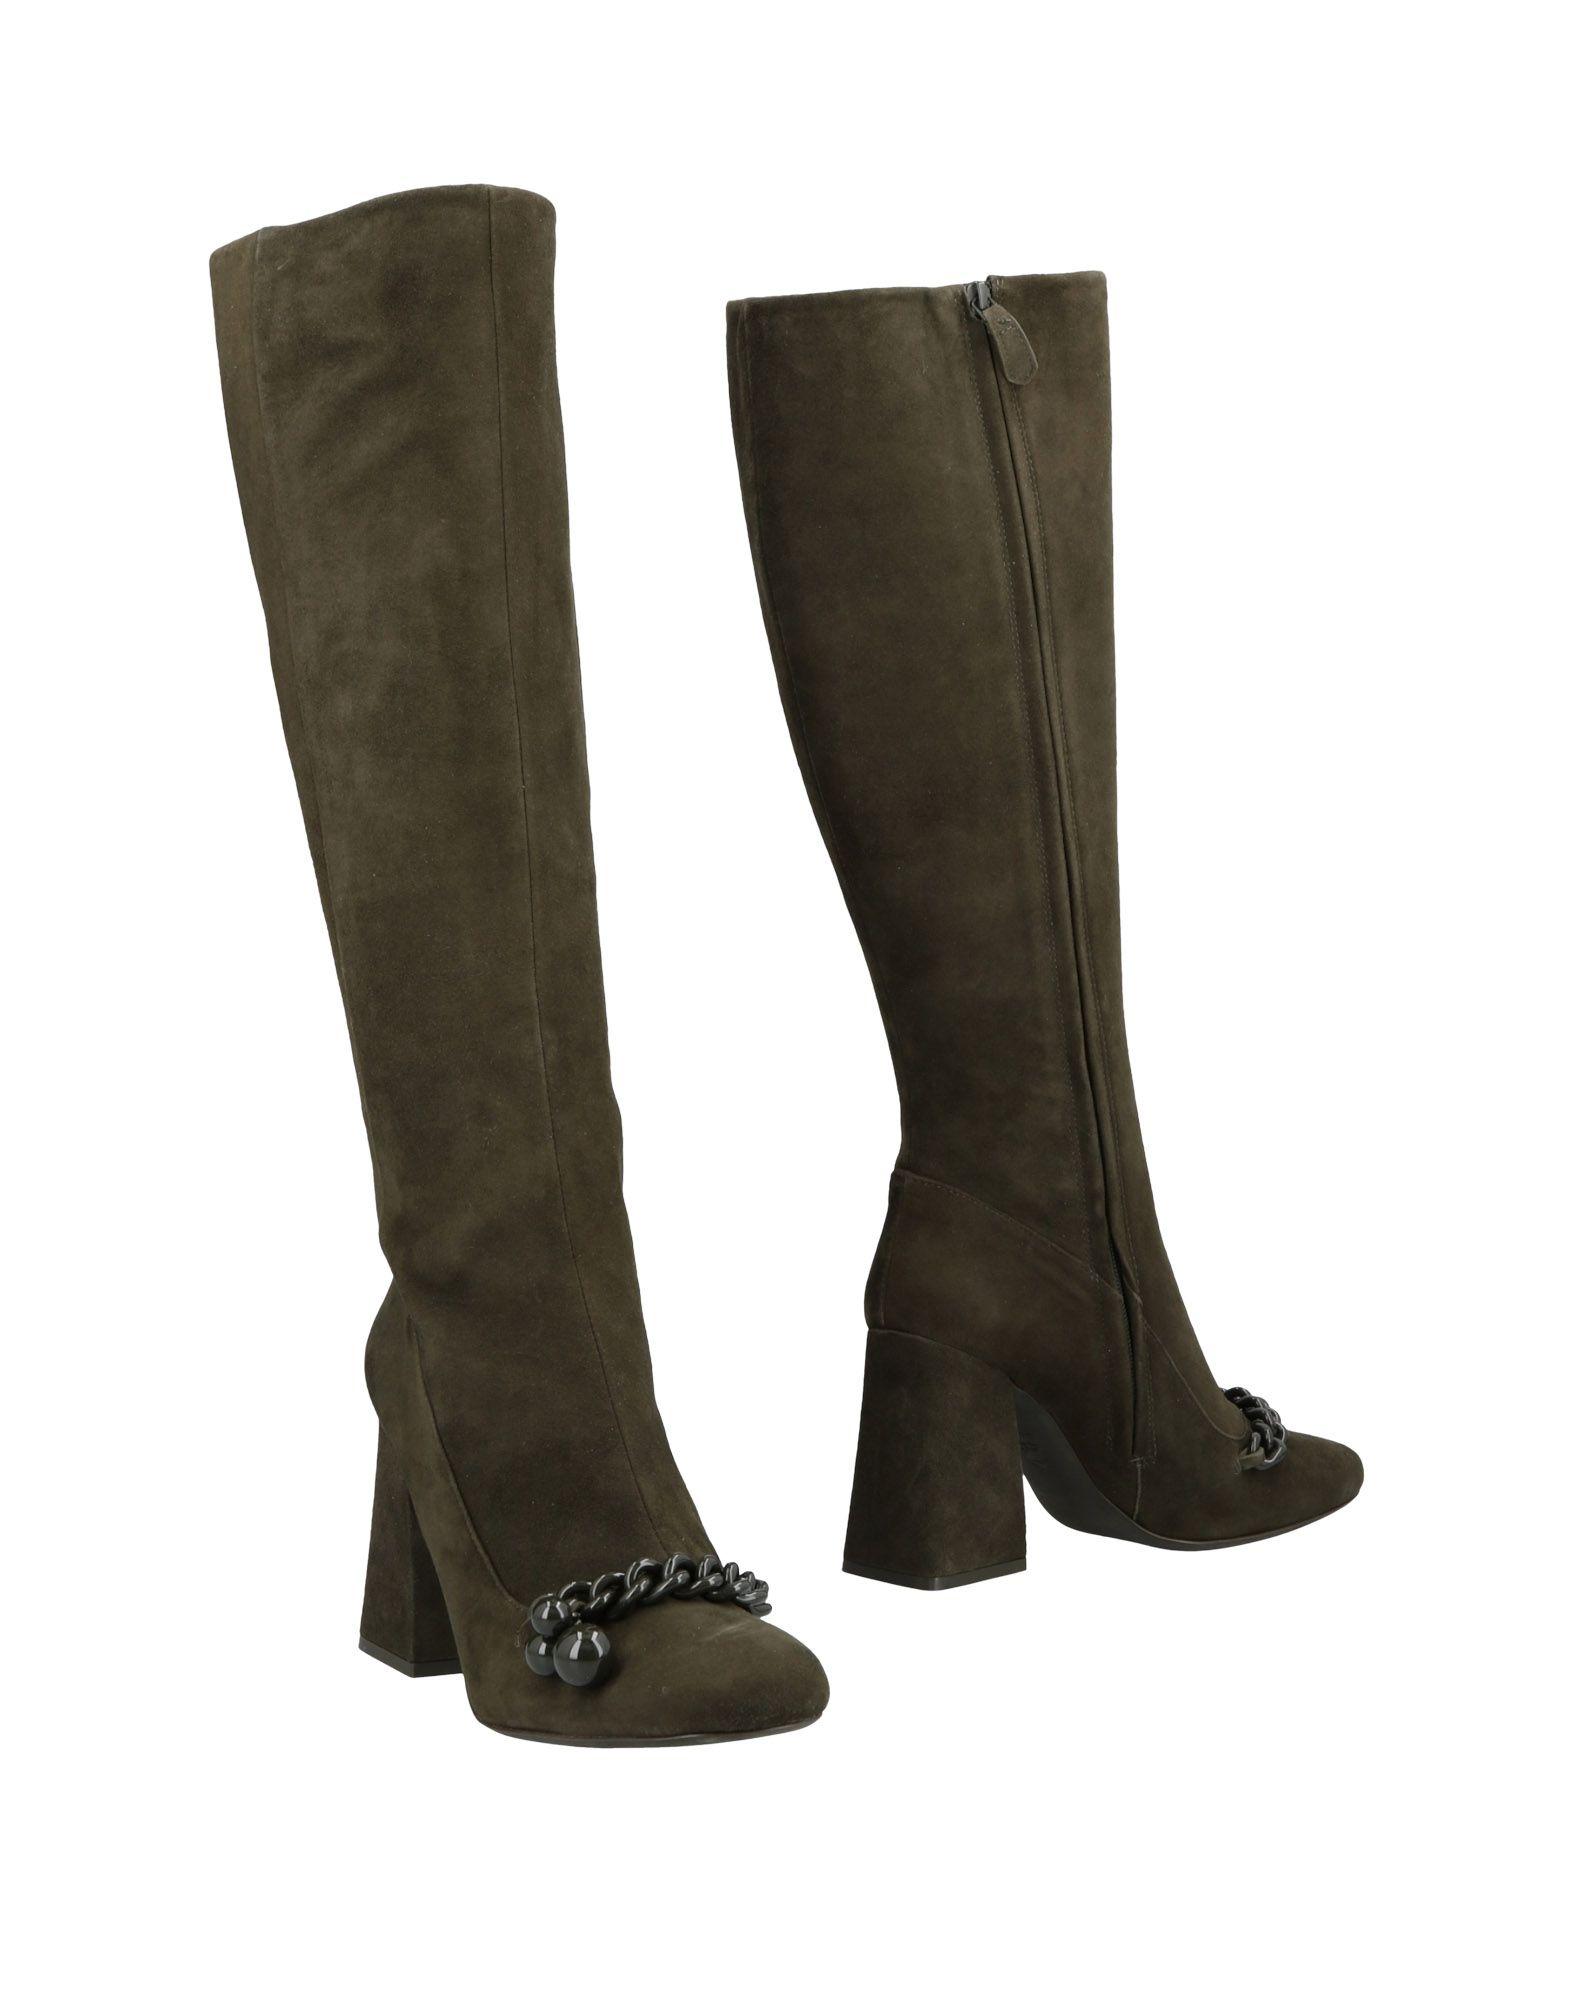 7f203479a79f Tory Burch Boots In Dark Green